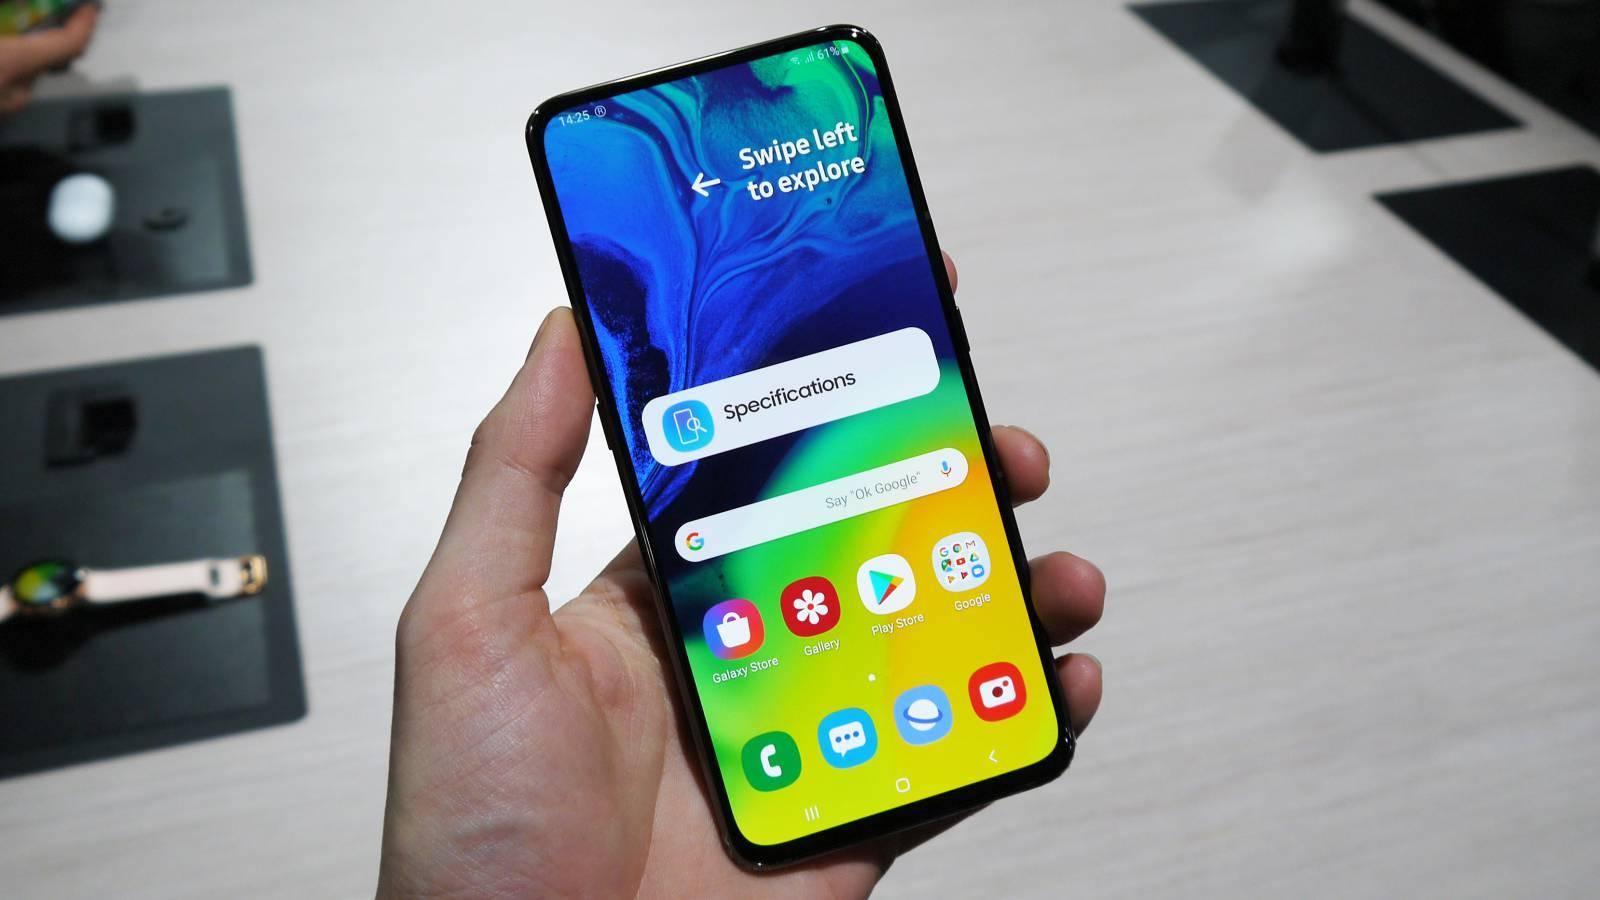 Samsung GALAXY S11 oneui 2.1